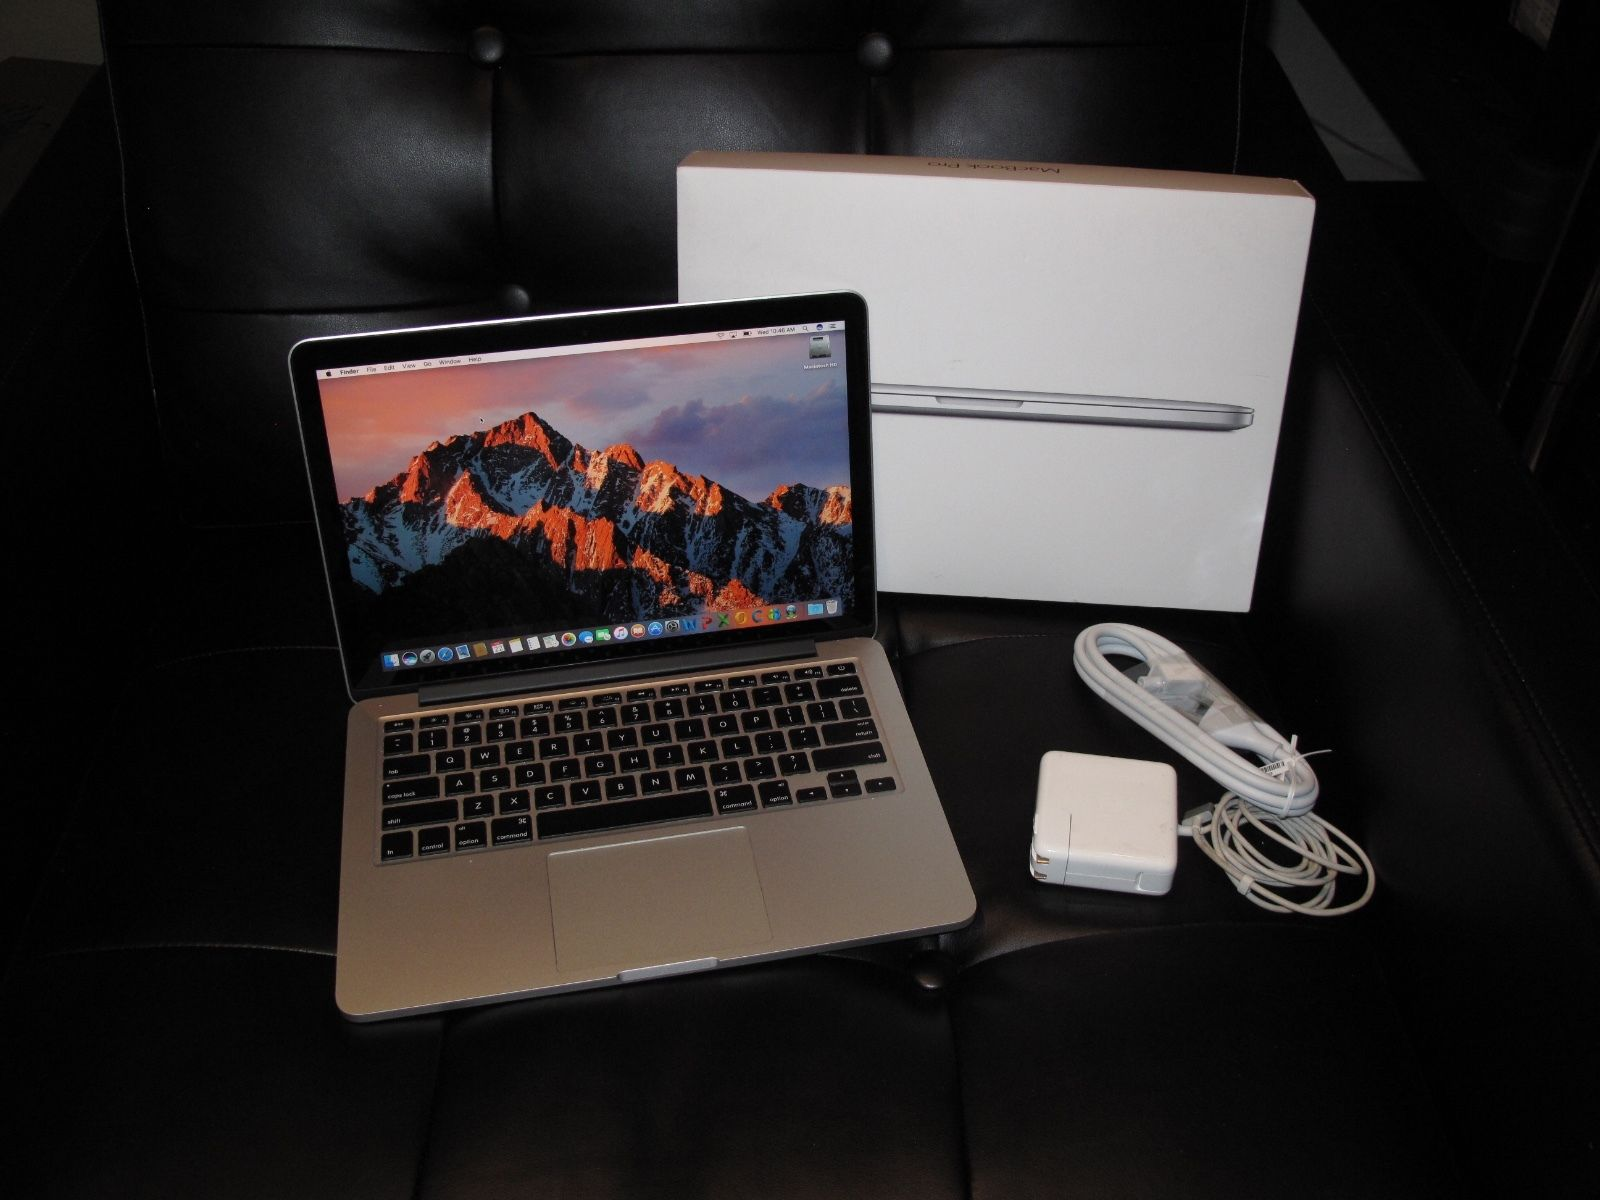 MacBook Pro RETINA Early 2013 3.0 GHz Core i7-3540M BTO/CTO - MacBookPro10,2 - A1425 - 2672